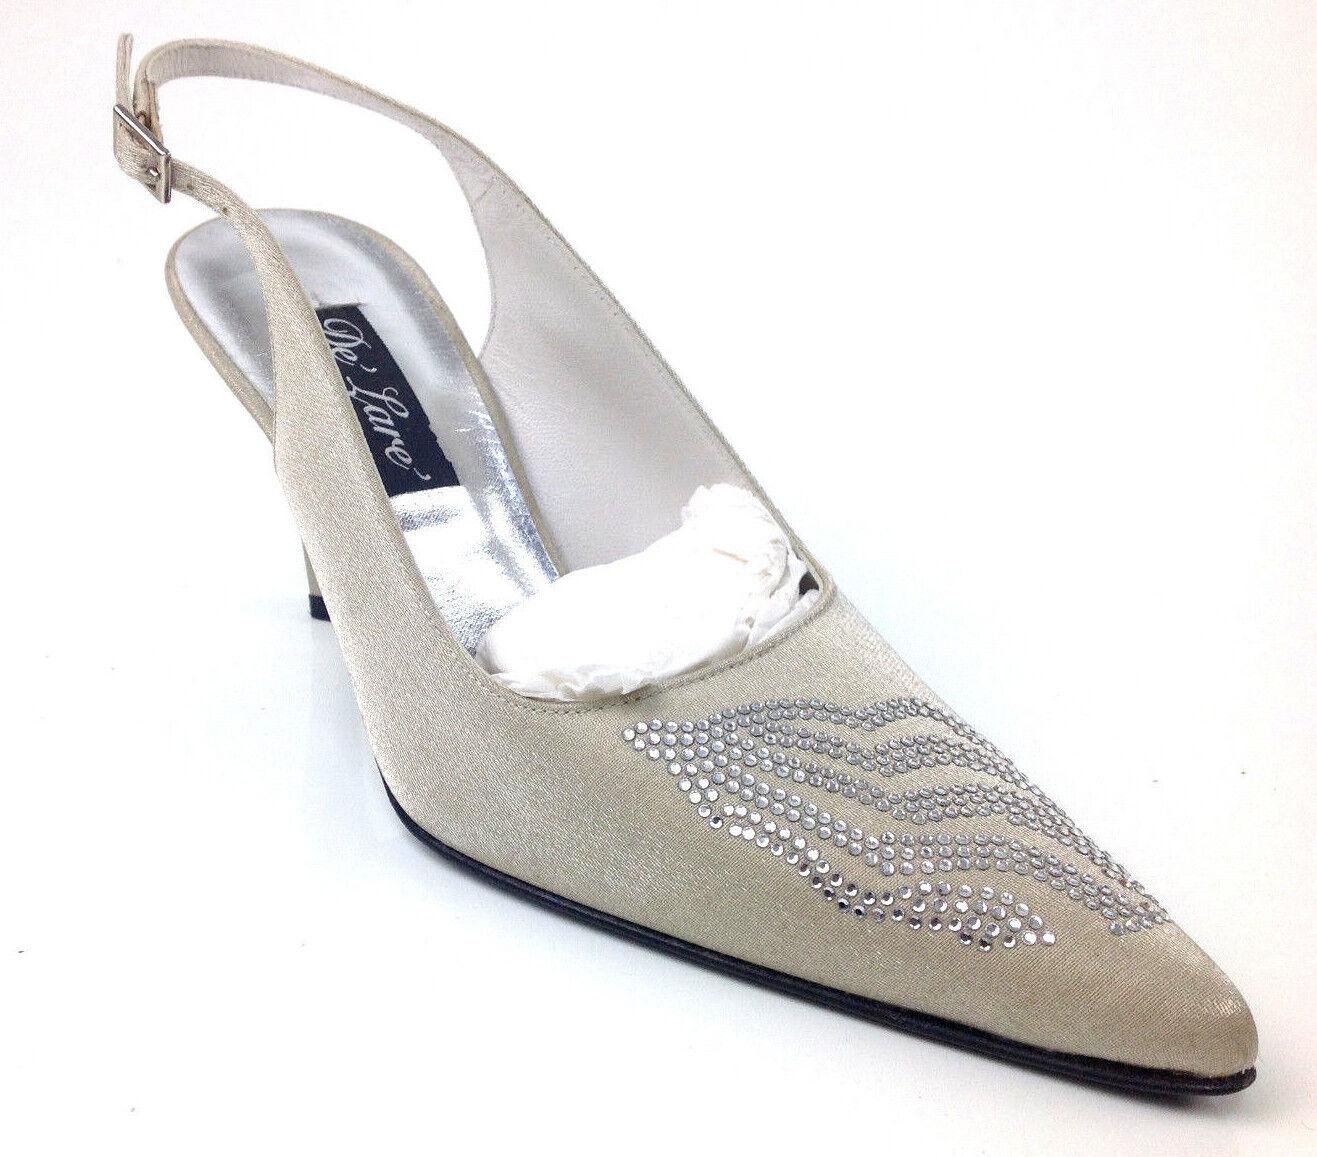 Stuart Weitzman Women's  Dazzling  Heels color Oyster Sparkle Size US 6.5 C